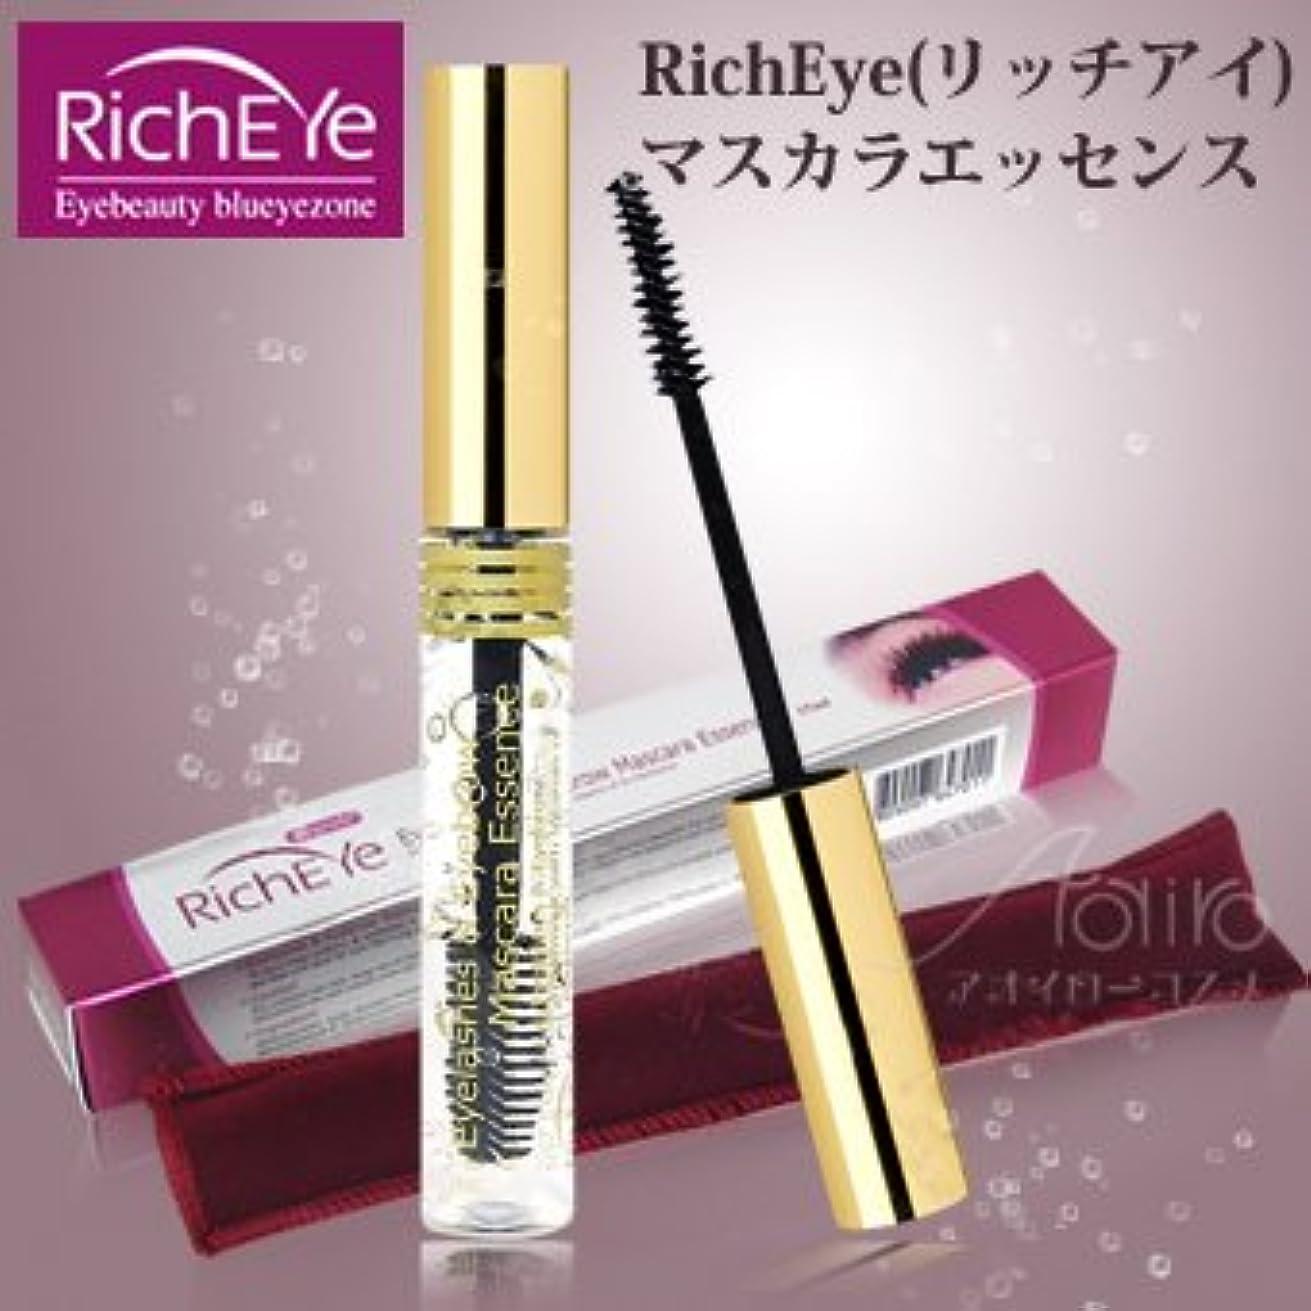 RichEye(リッチアイ)マスカラエッセンス (1個)